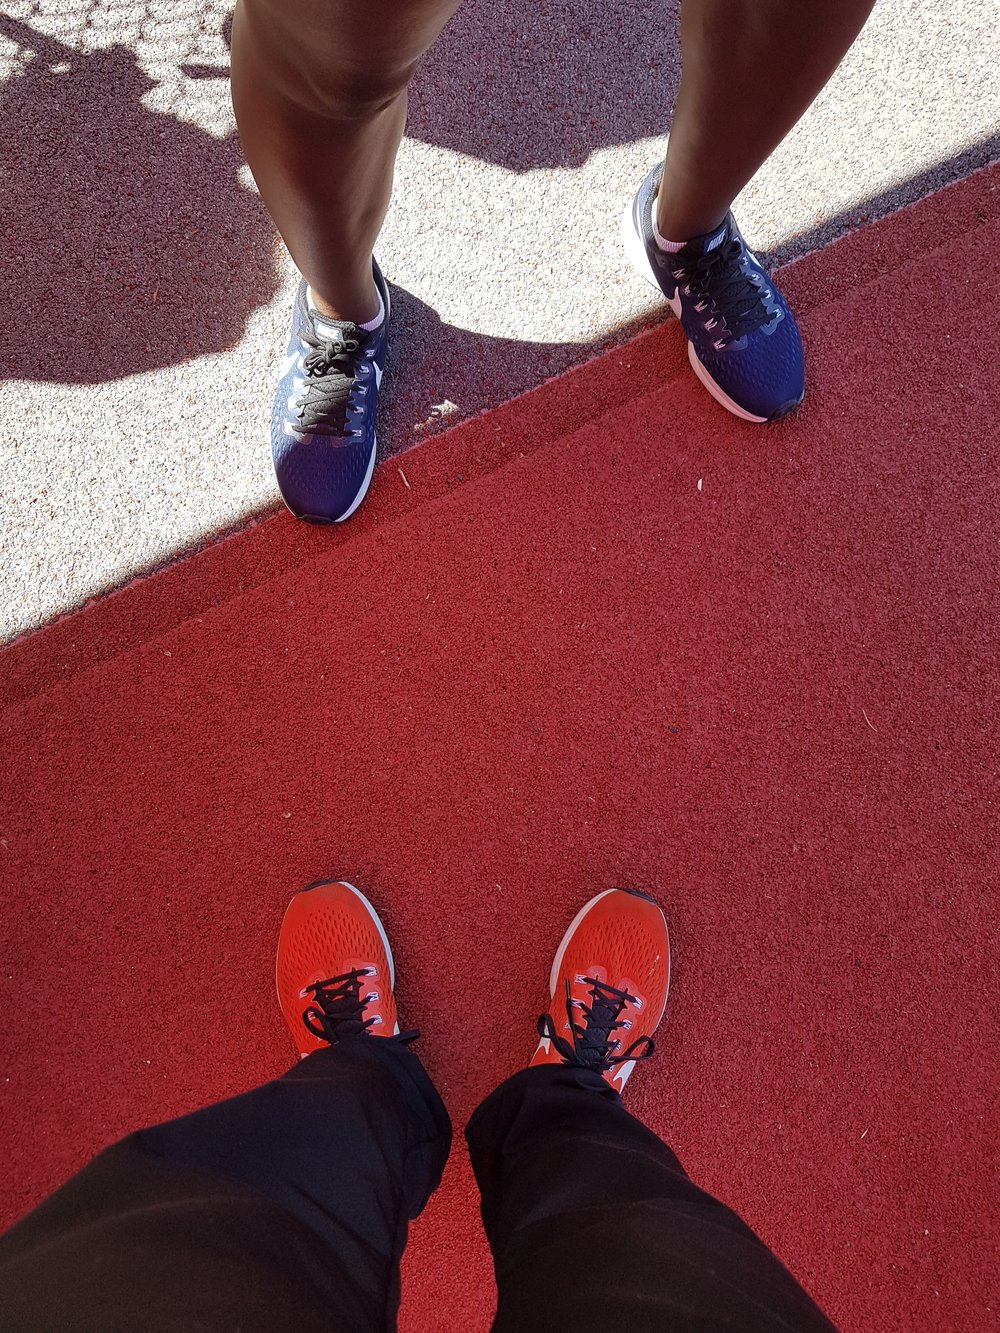 track legs